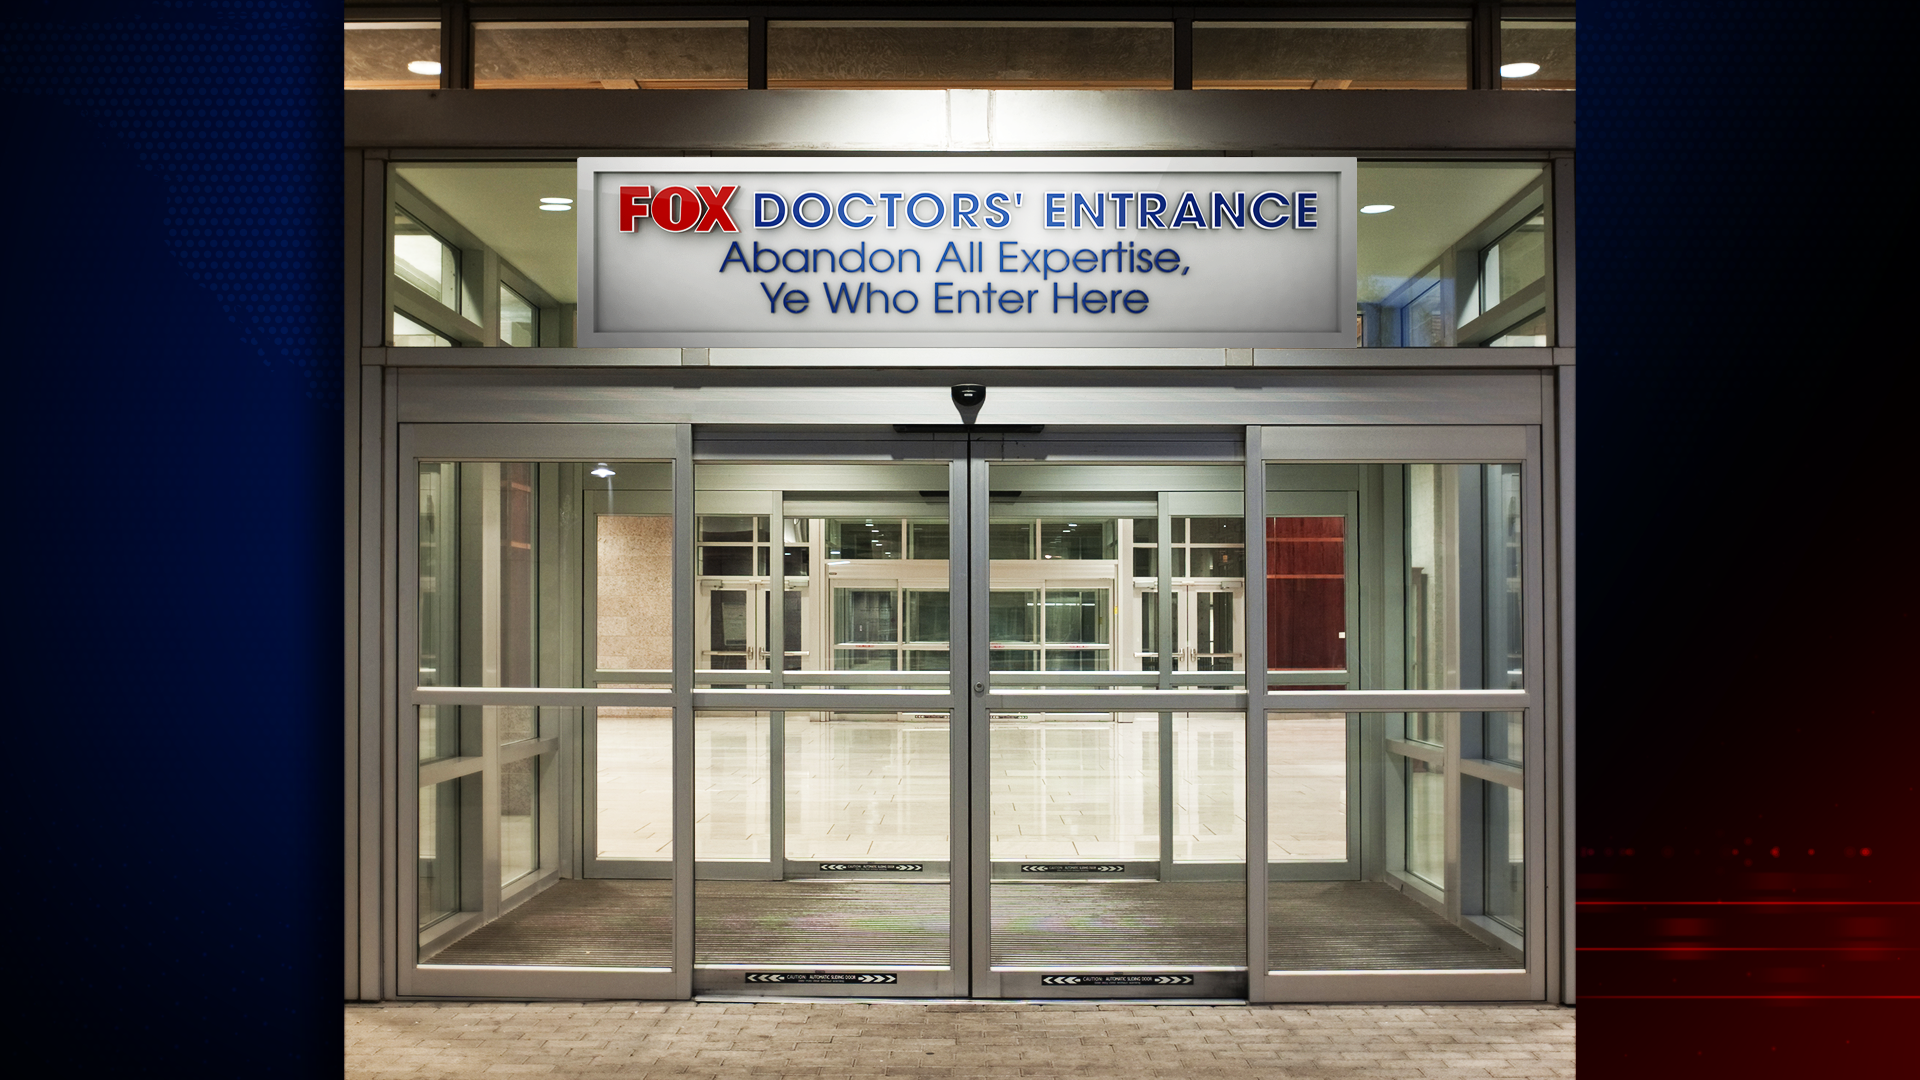 FF_FoxDoctorsEntrance.png